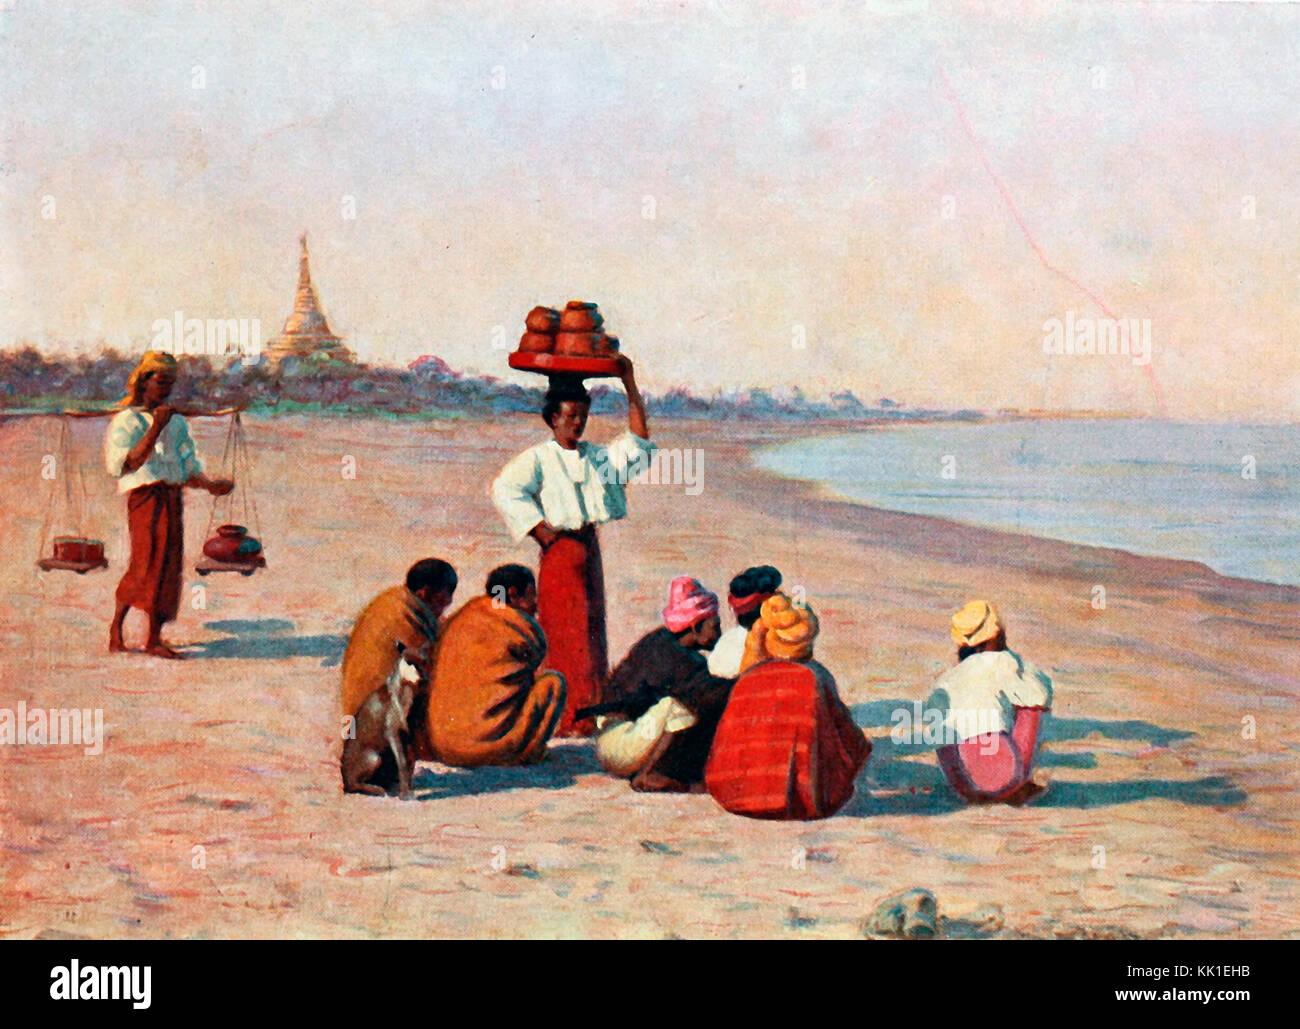 Waiting for the steamer, Burma, circa 1875 - Stock Image